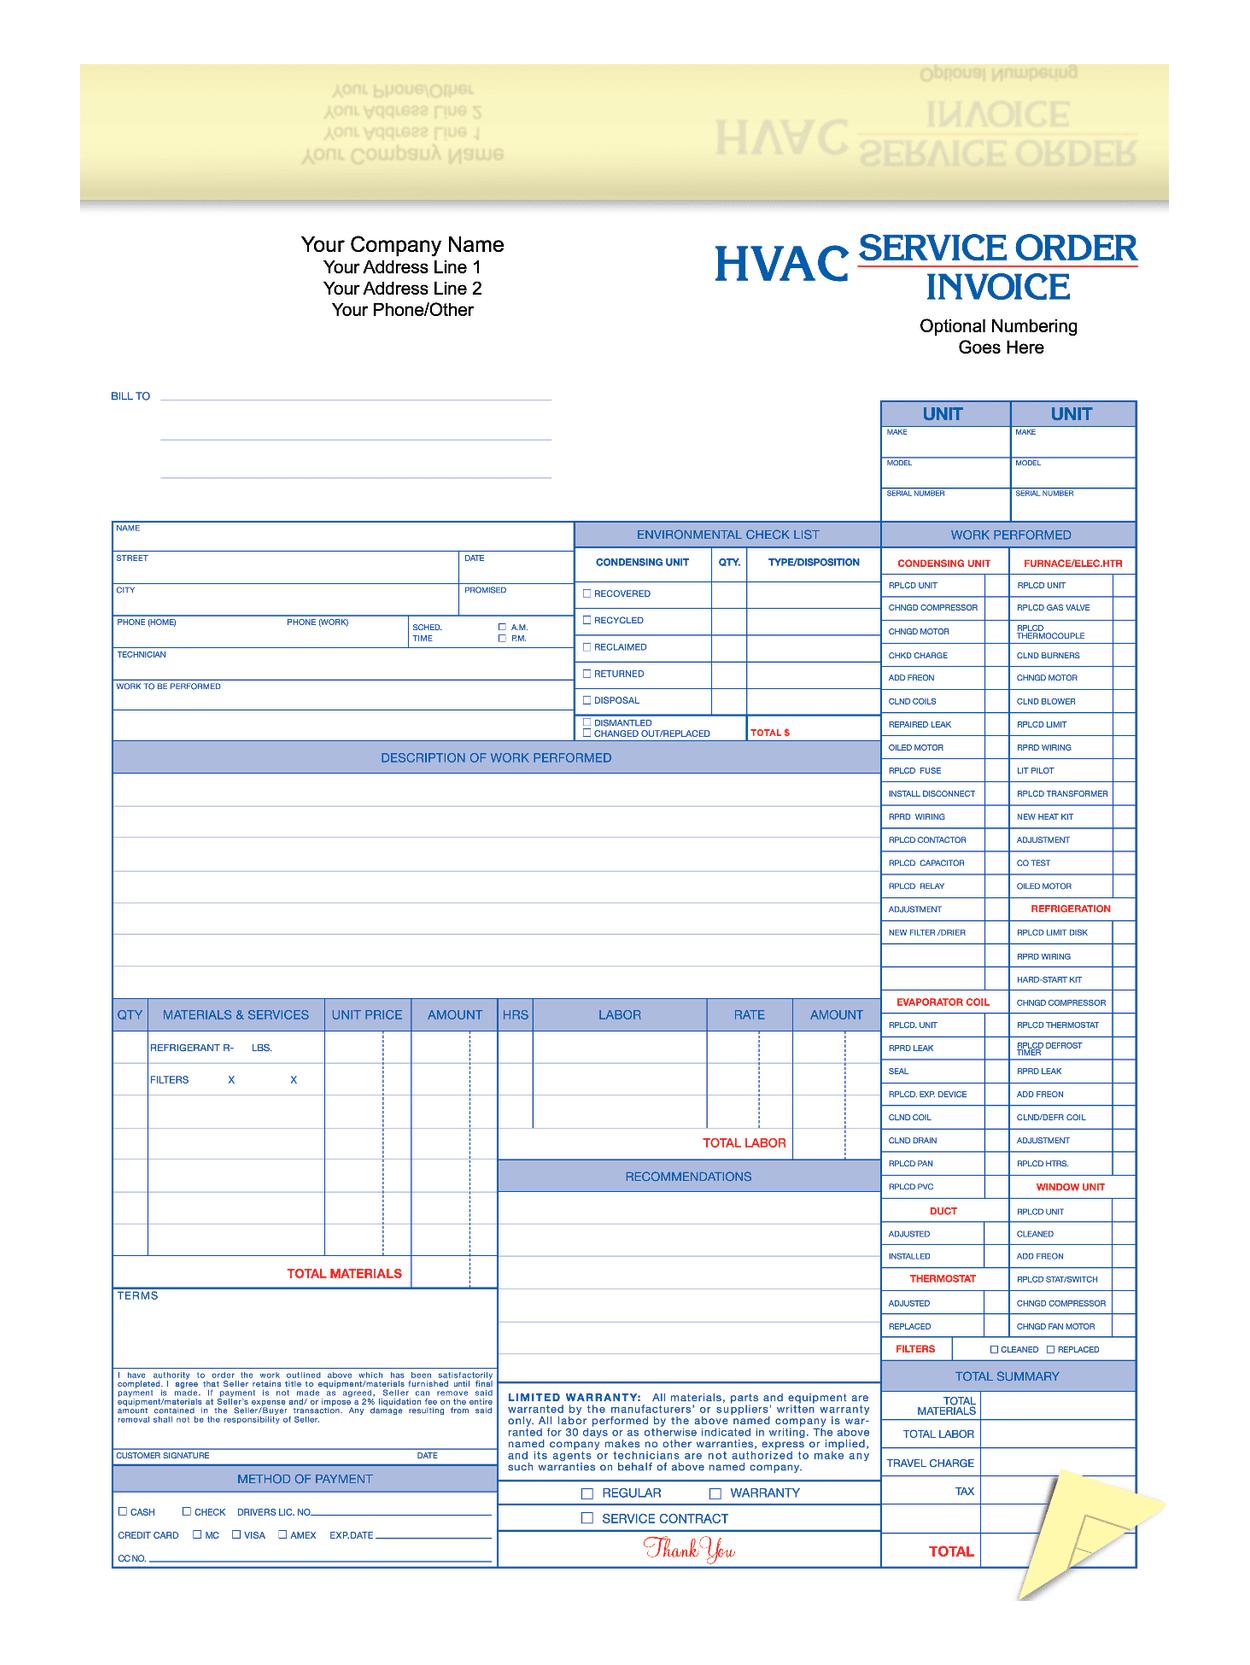 Custom 2 Part Business Forms Hvac Service Office Depot